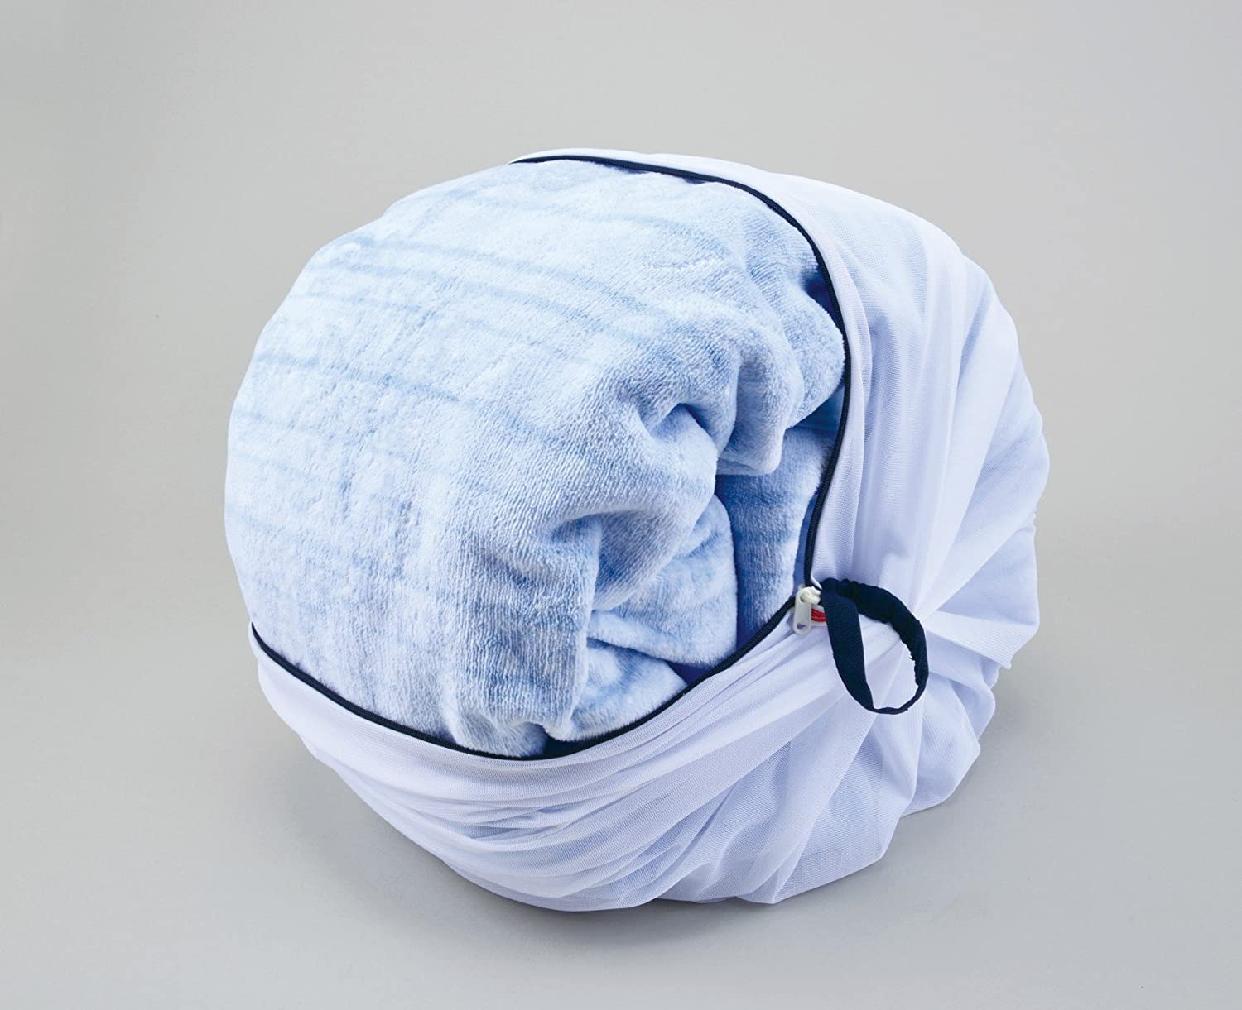 Daiya(ダイヤ) ふくらむ洗濯ネット特大50の商品画像6